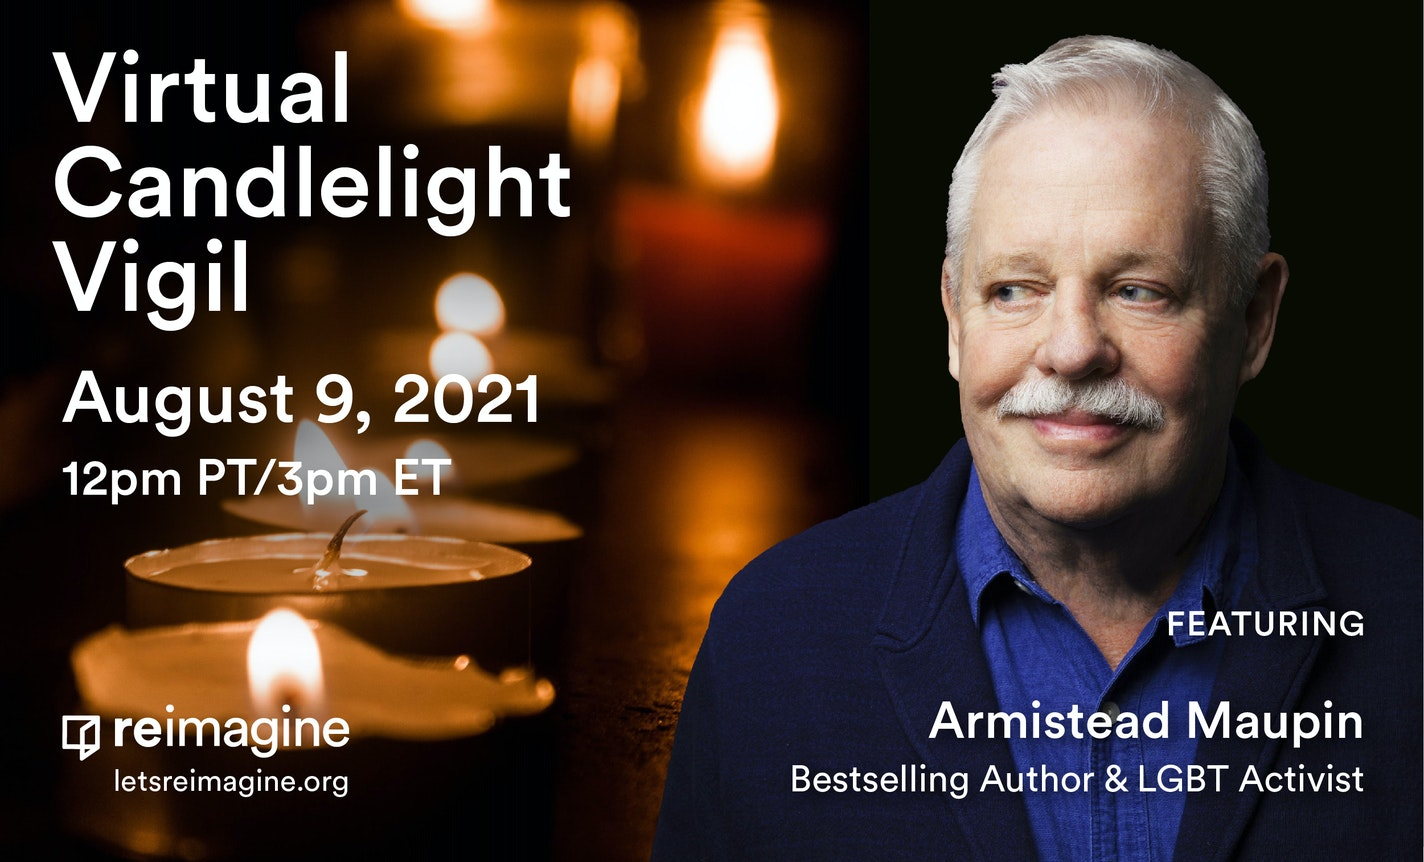 Reimagine Candlelight Vigil with Author Armistead Maupin